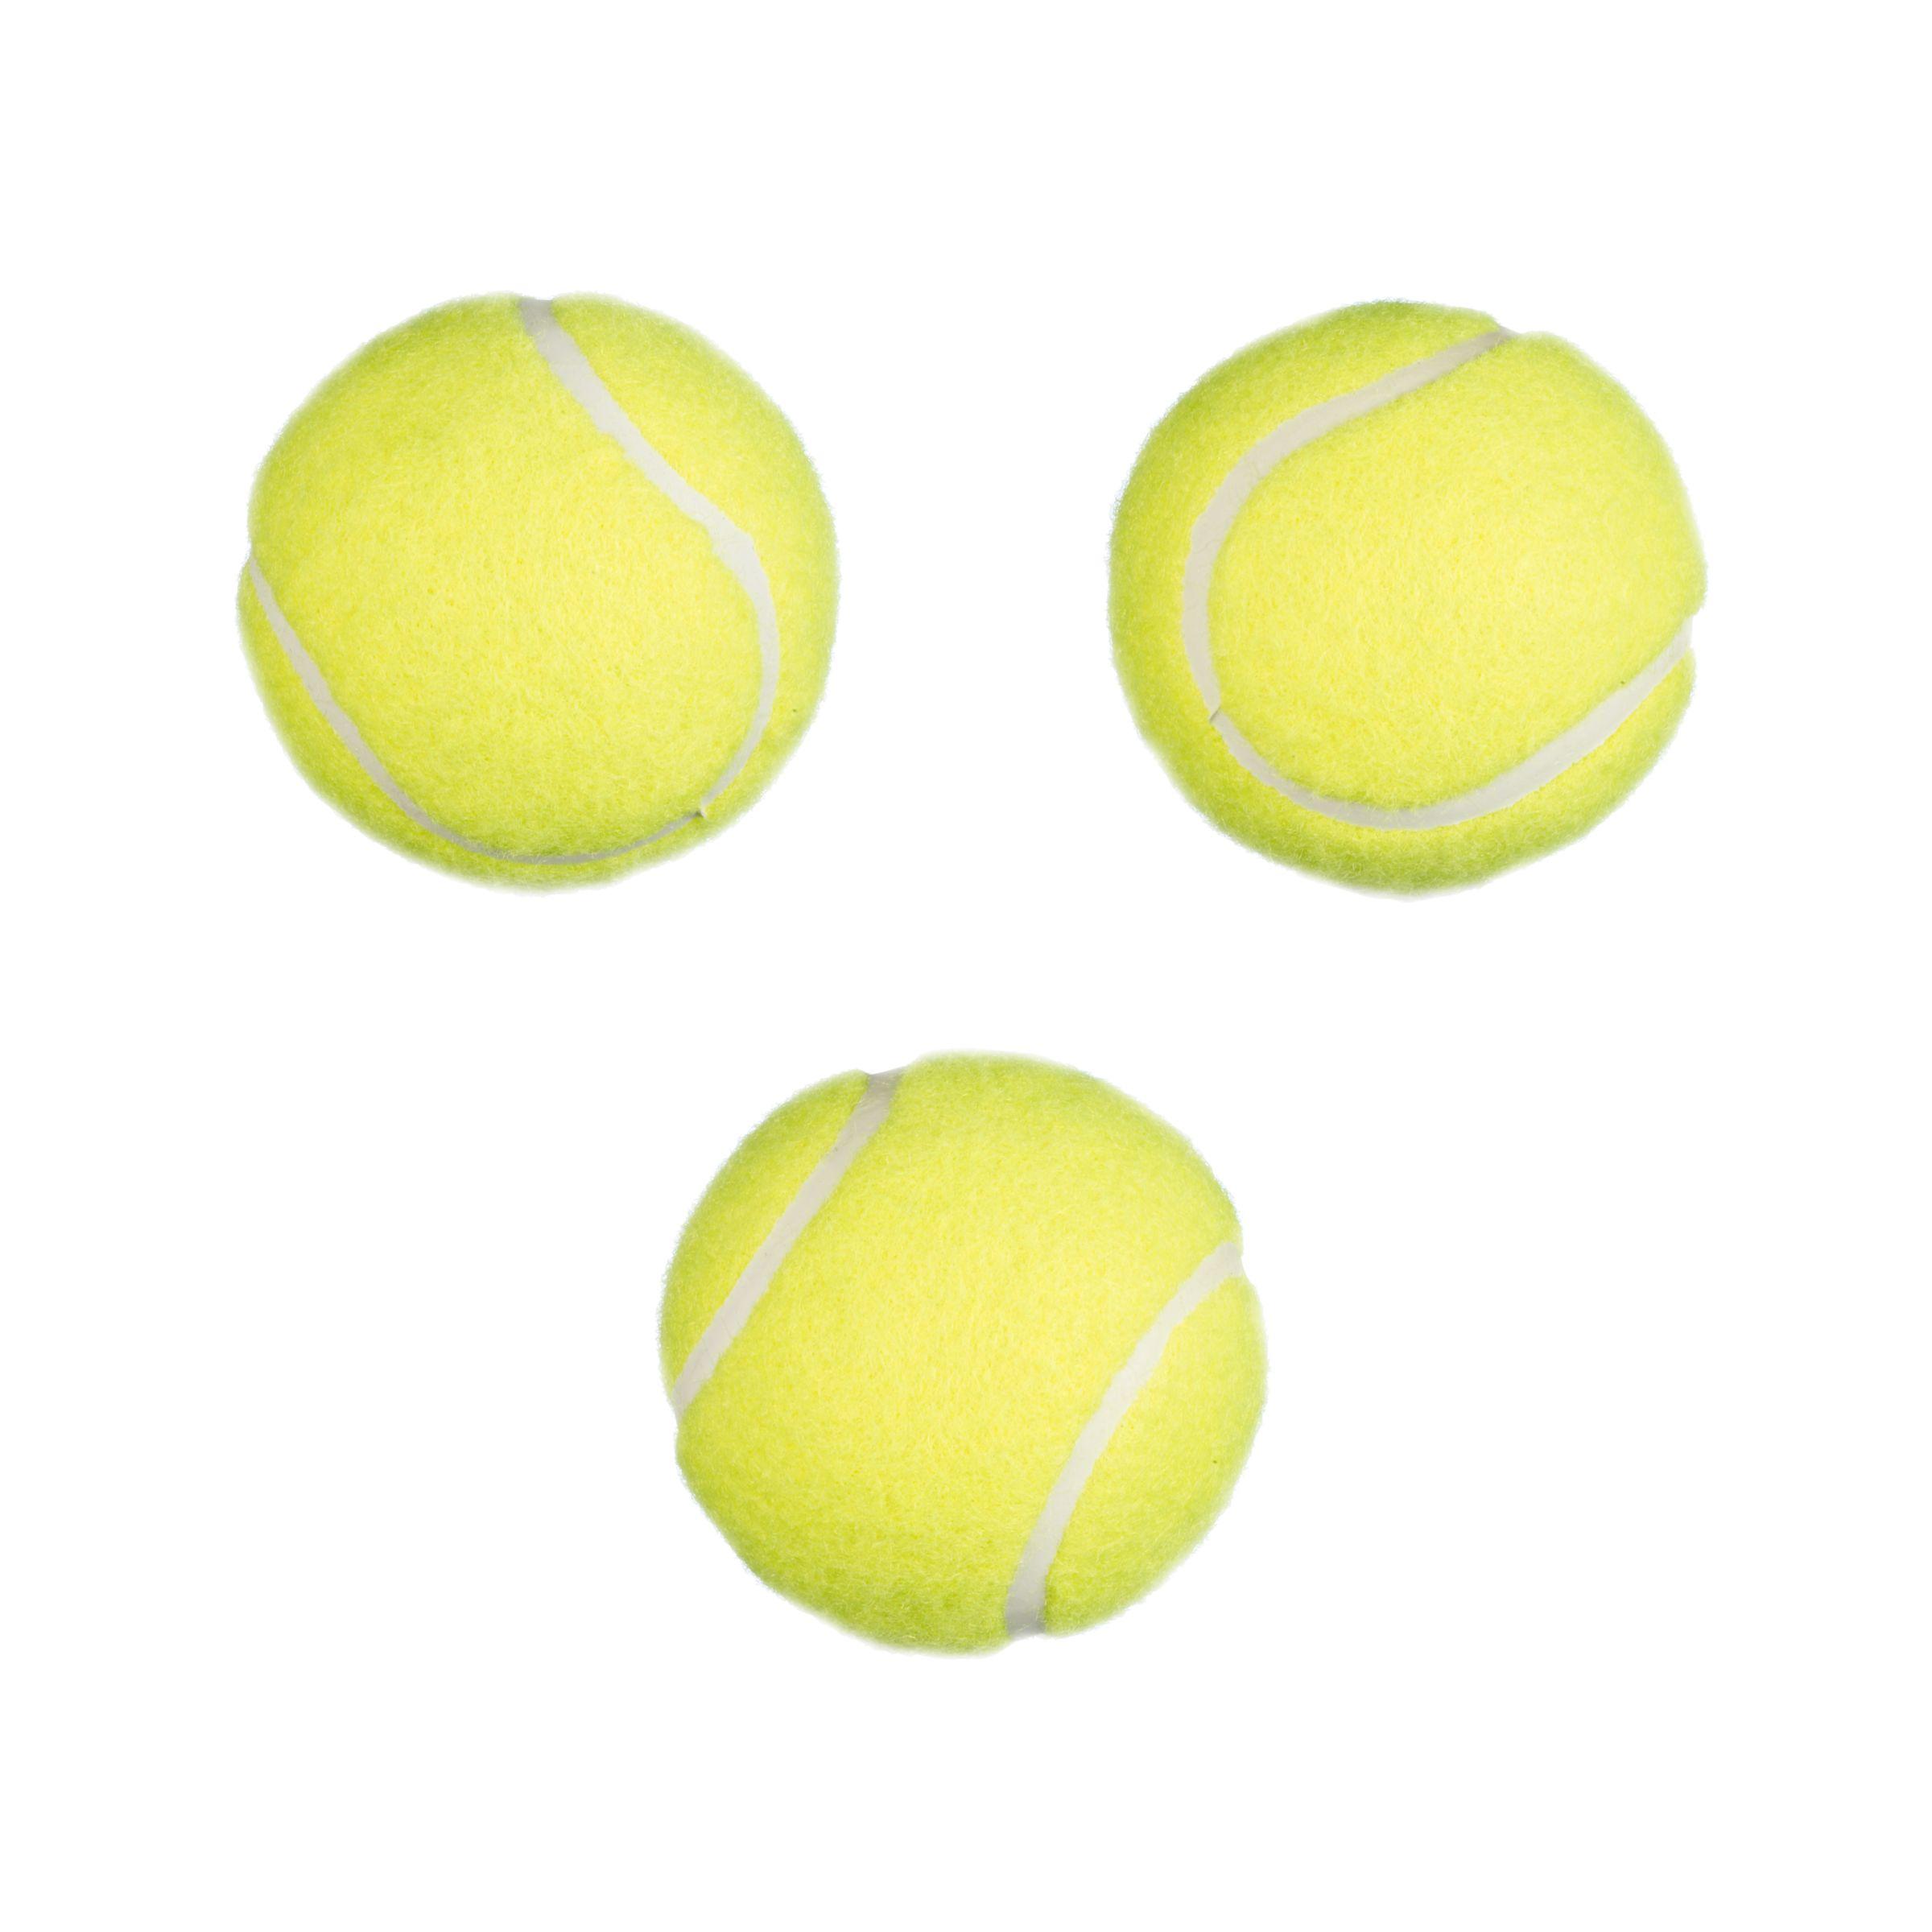 Mookie Toys Mookie Toys Tennis Balls, Pack of 3